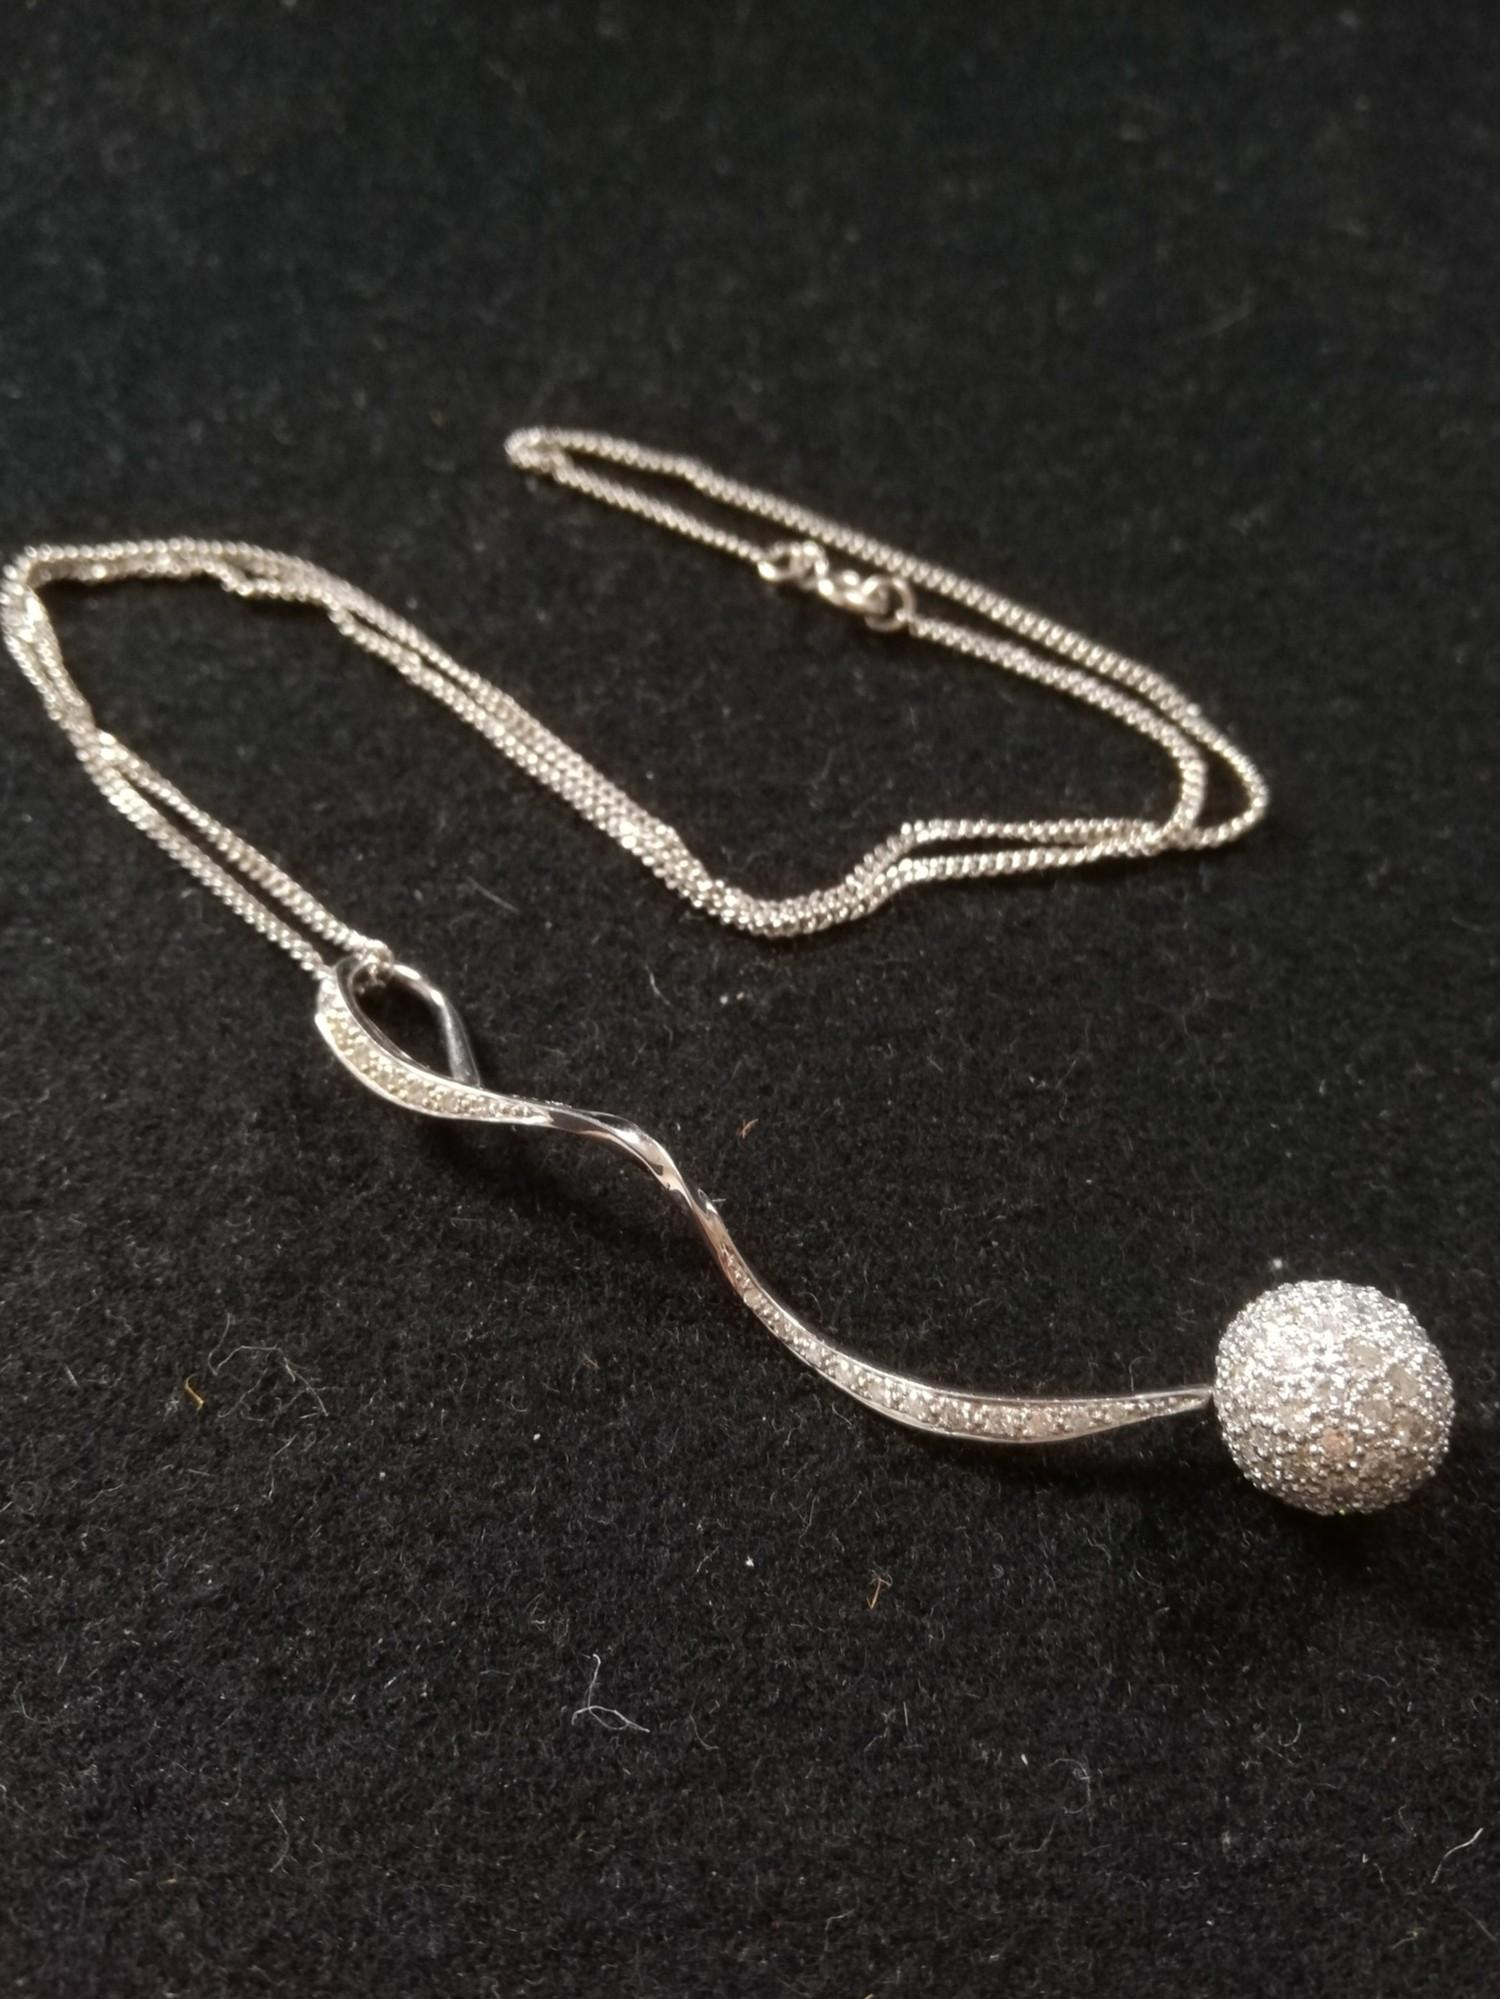 18ct Diamond ball pendant and chain